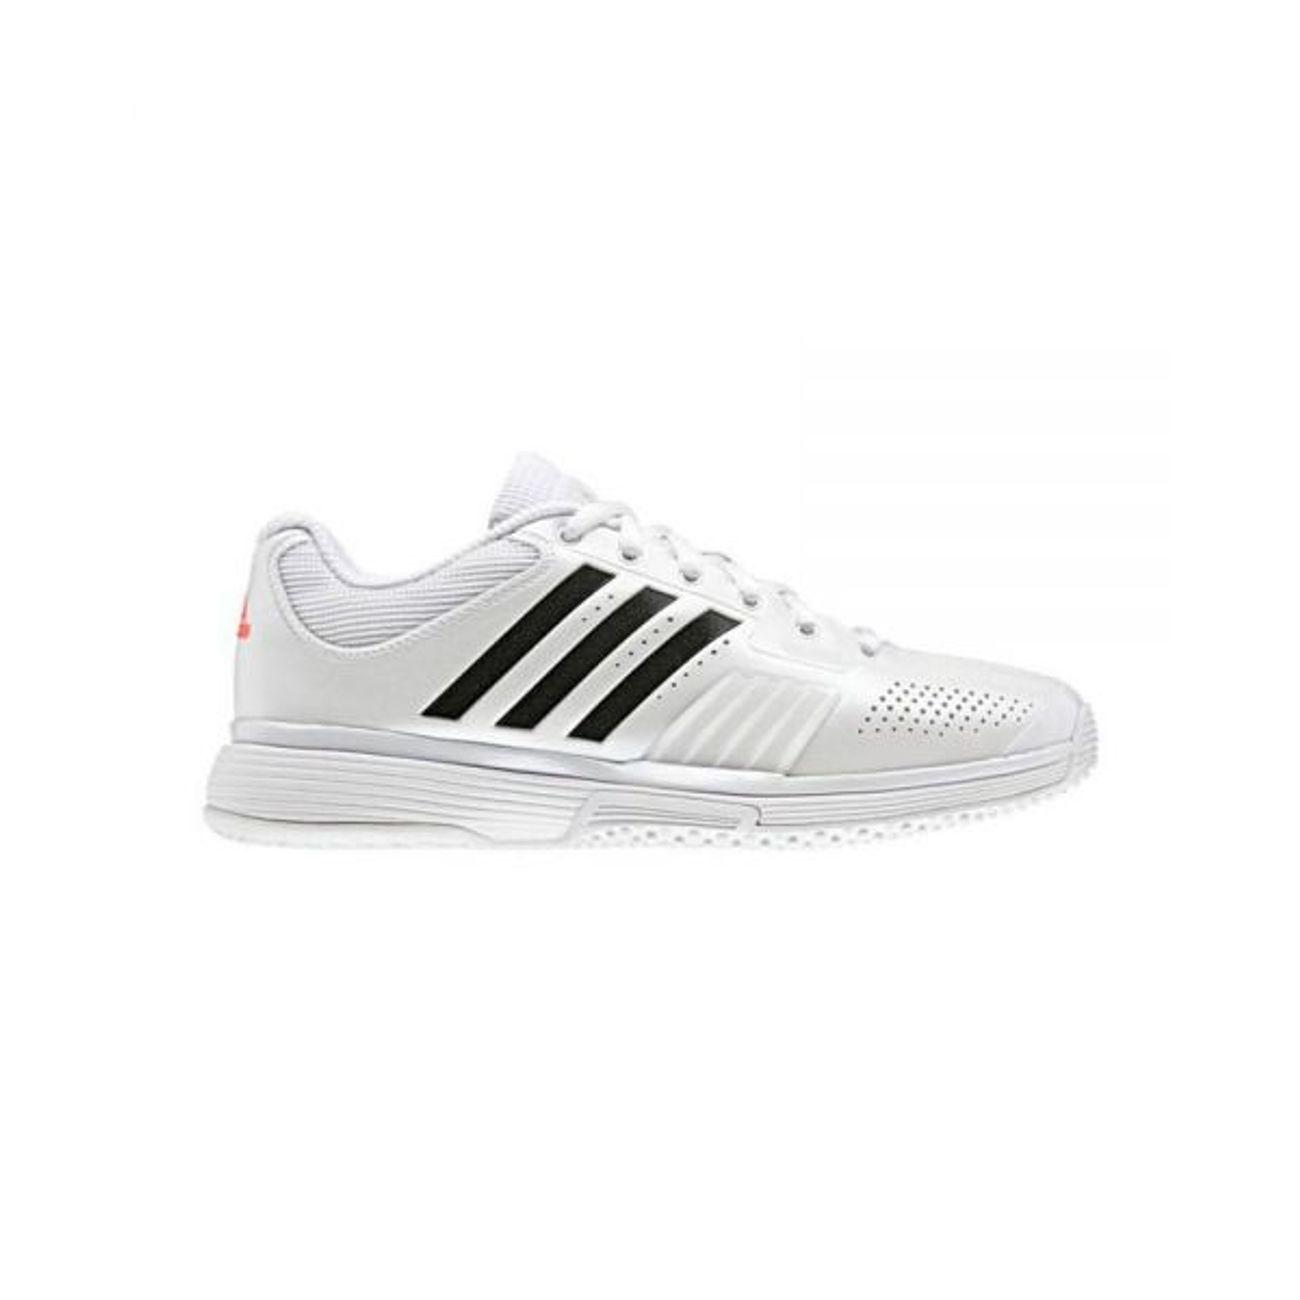 Adidas 17 Adipower Adulte Chaussures Barricade Padel ul3cKJTF1